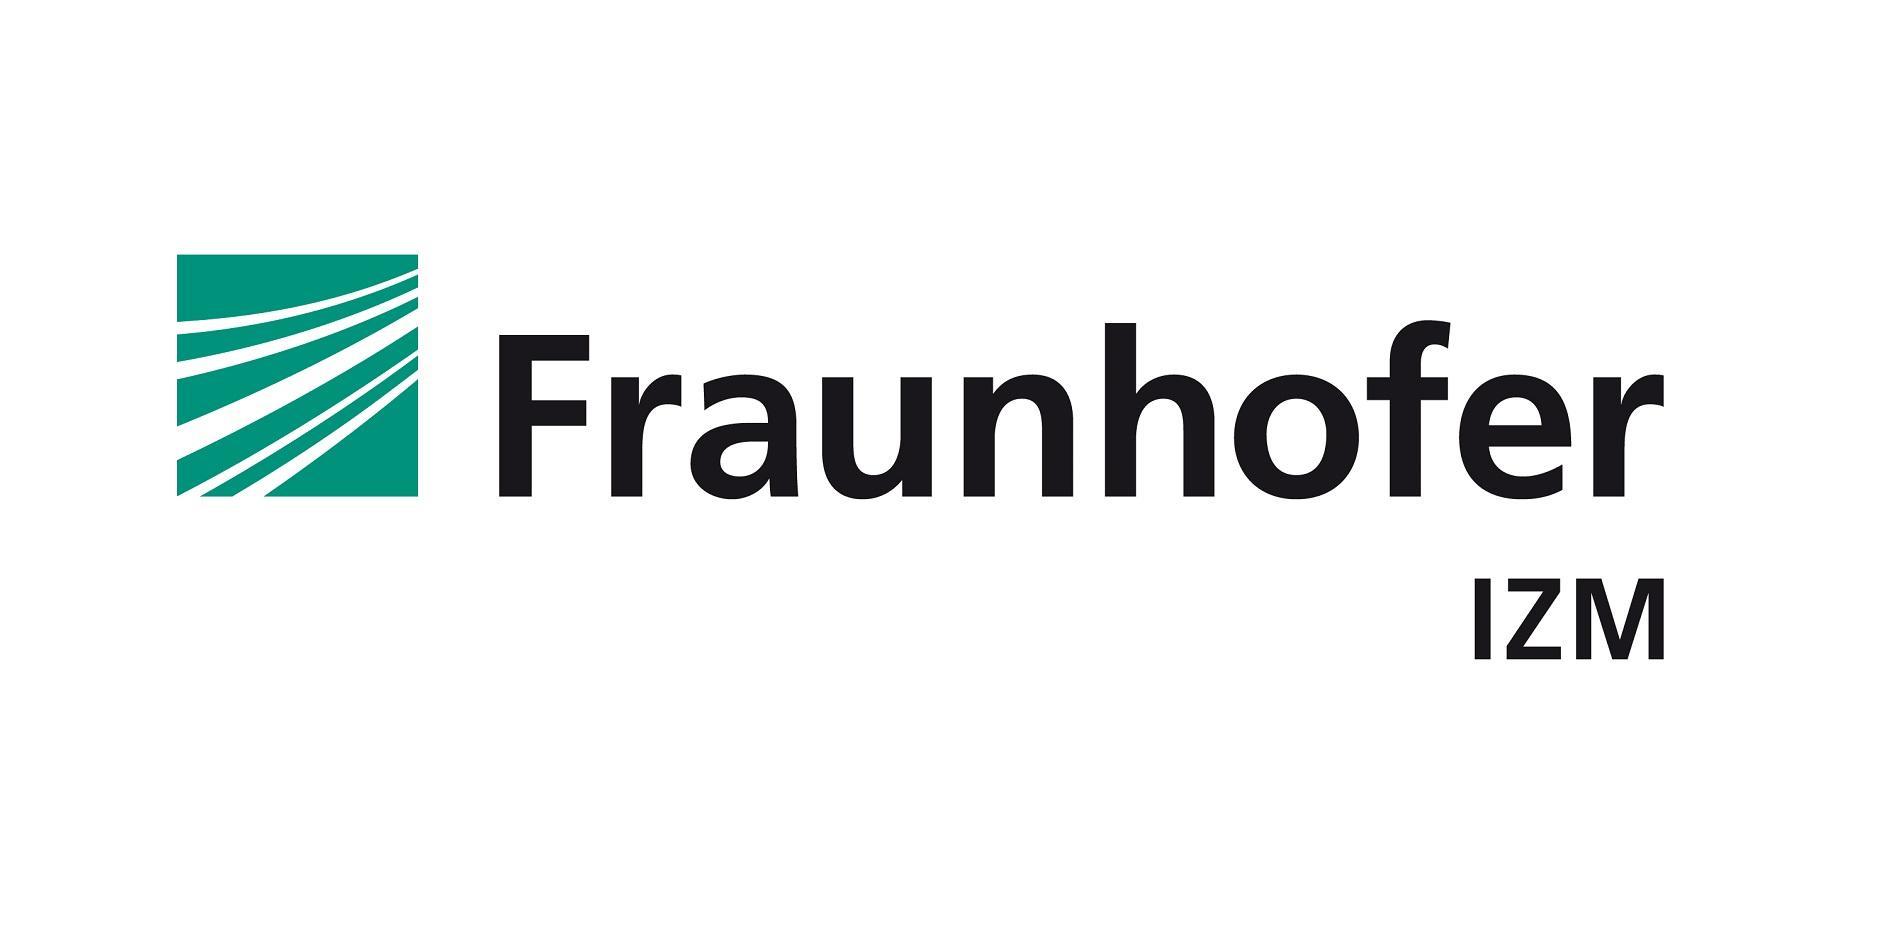 Fraunhofer_logo_white